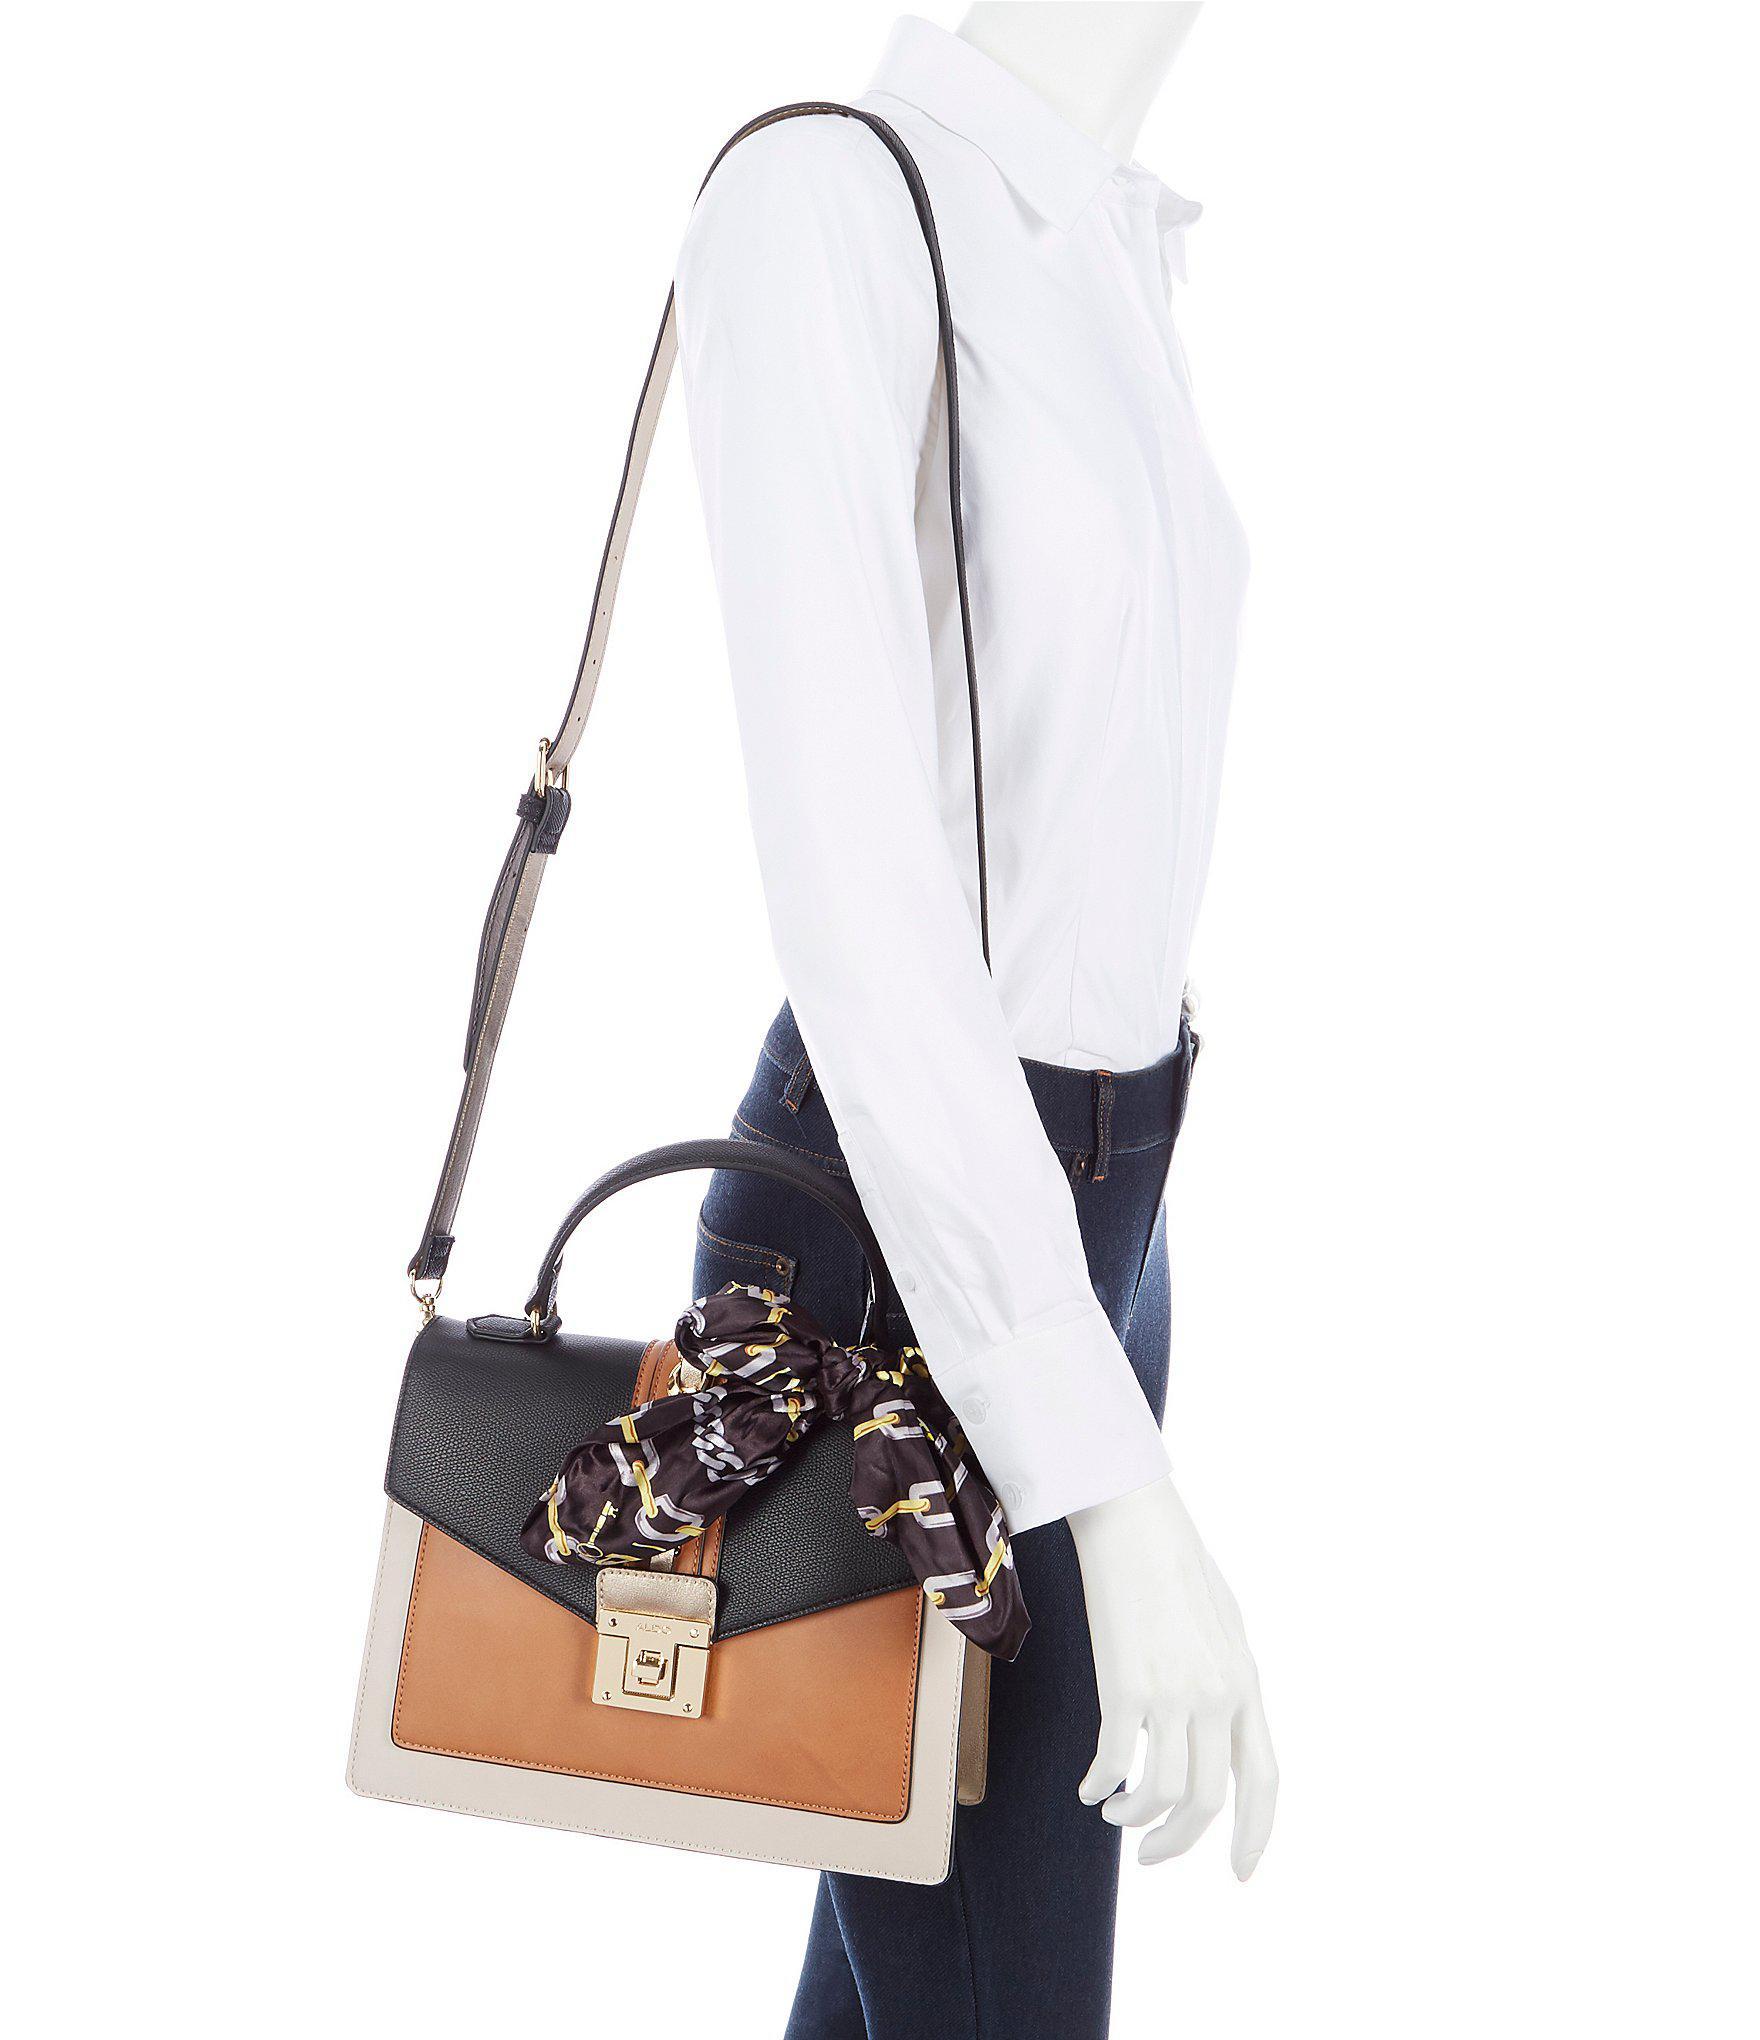 d11e1ae3c09 Lyst - ALDO Glendaa Small Top Handle Black Colorblock Handbag in Black